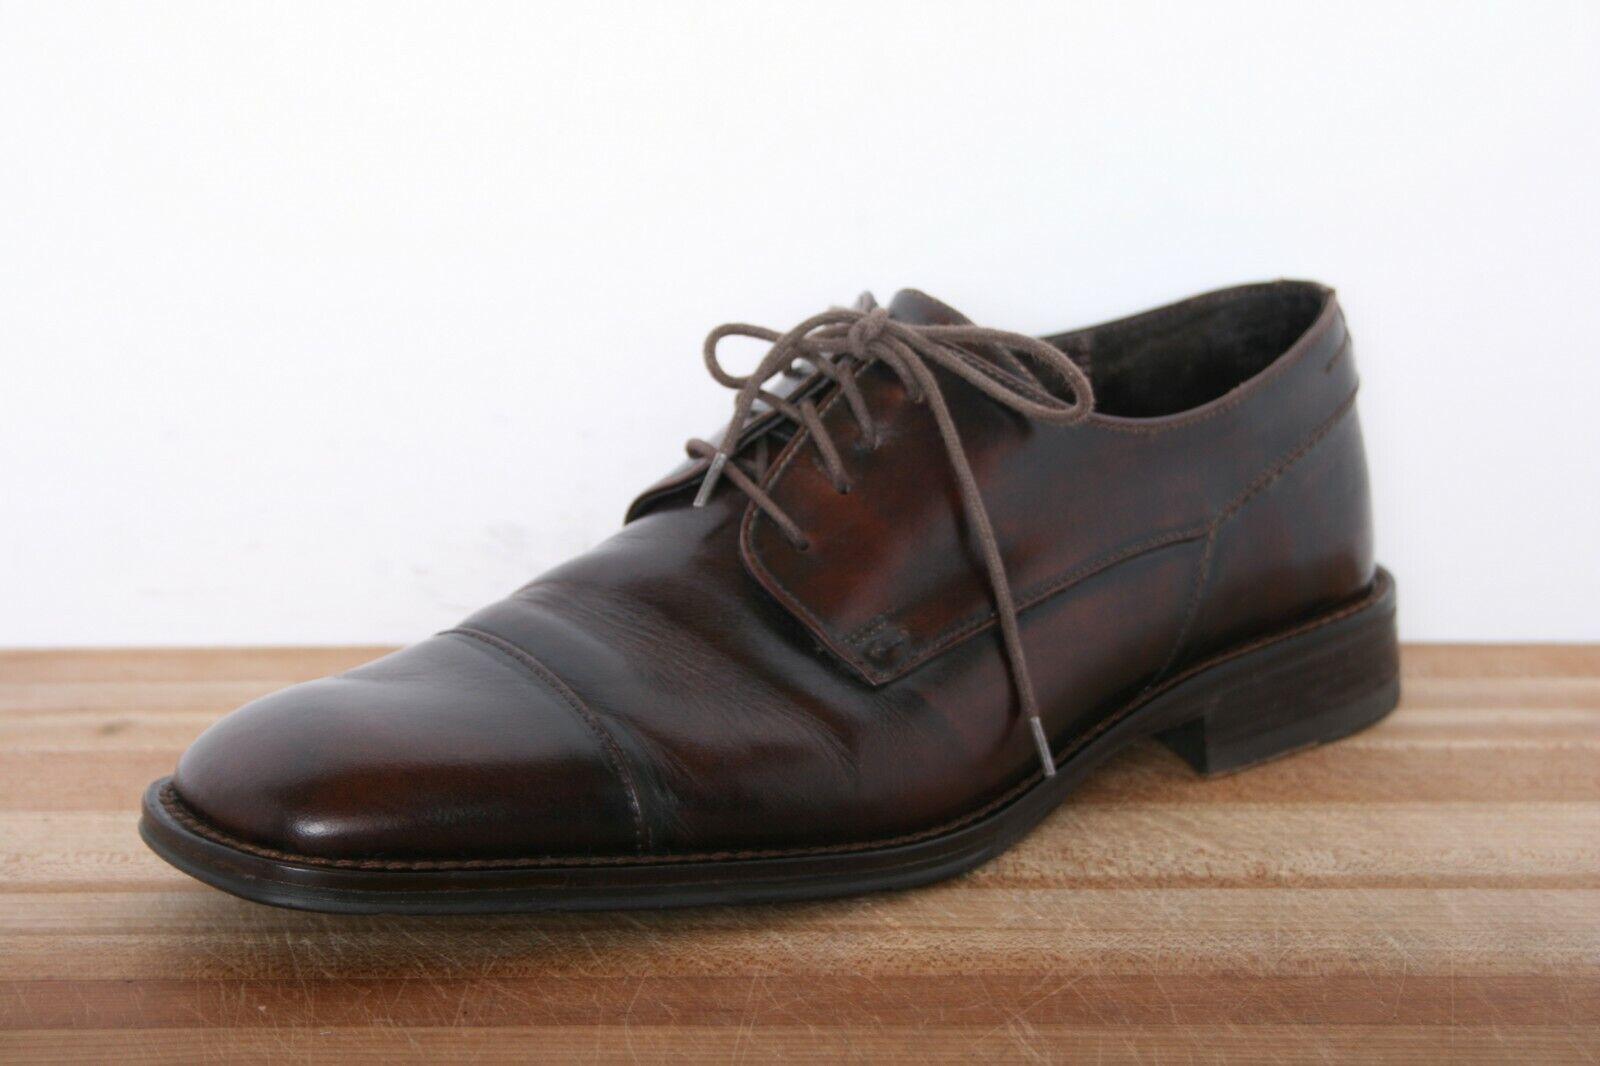 JOHNSTON & MURPHY Brown Leather Square Cap Toe Oxfords Dress shoes Sz. 9M